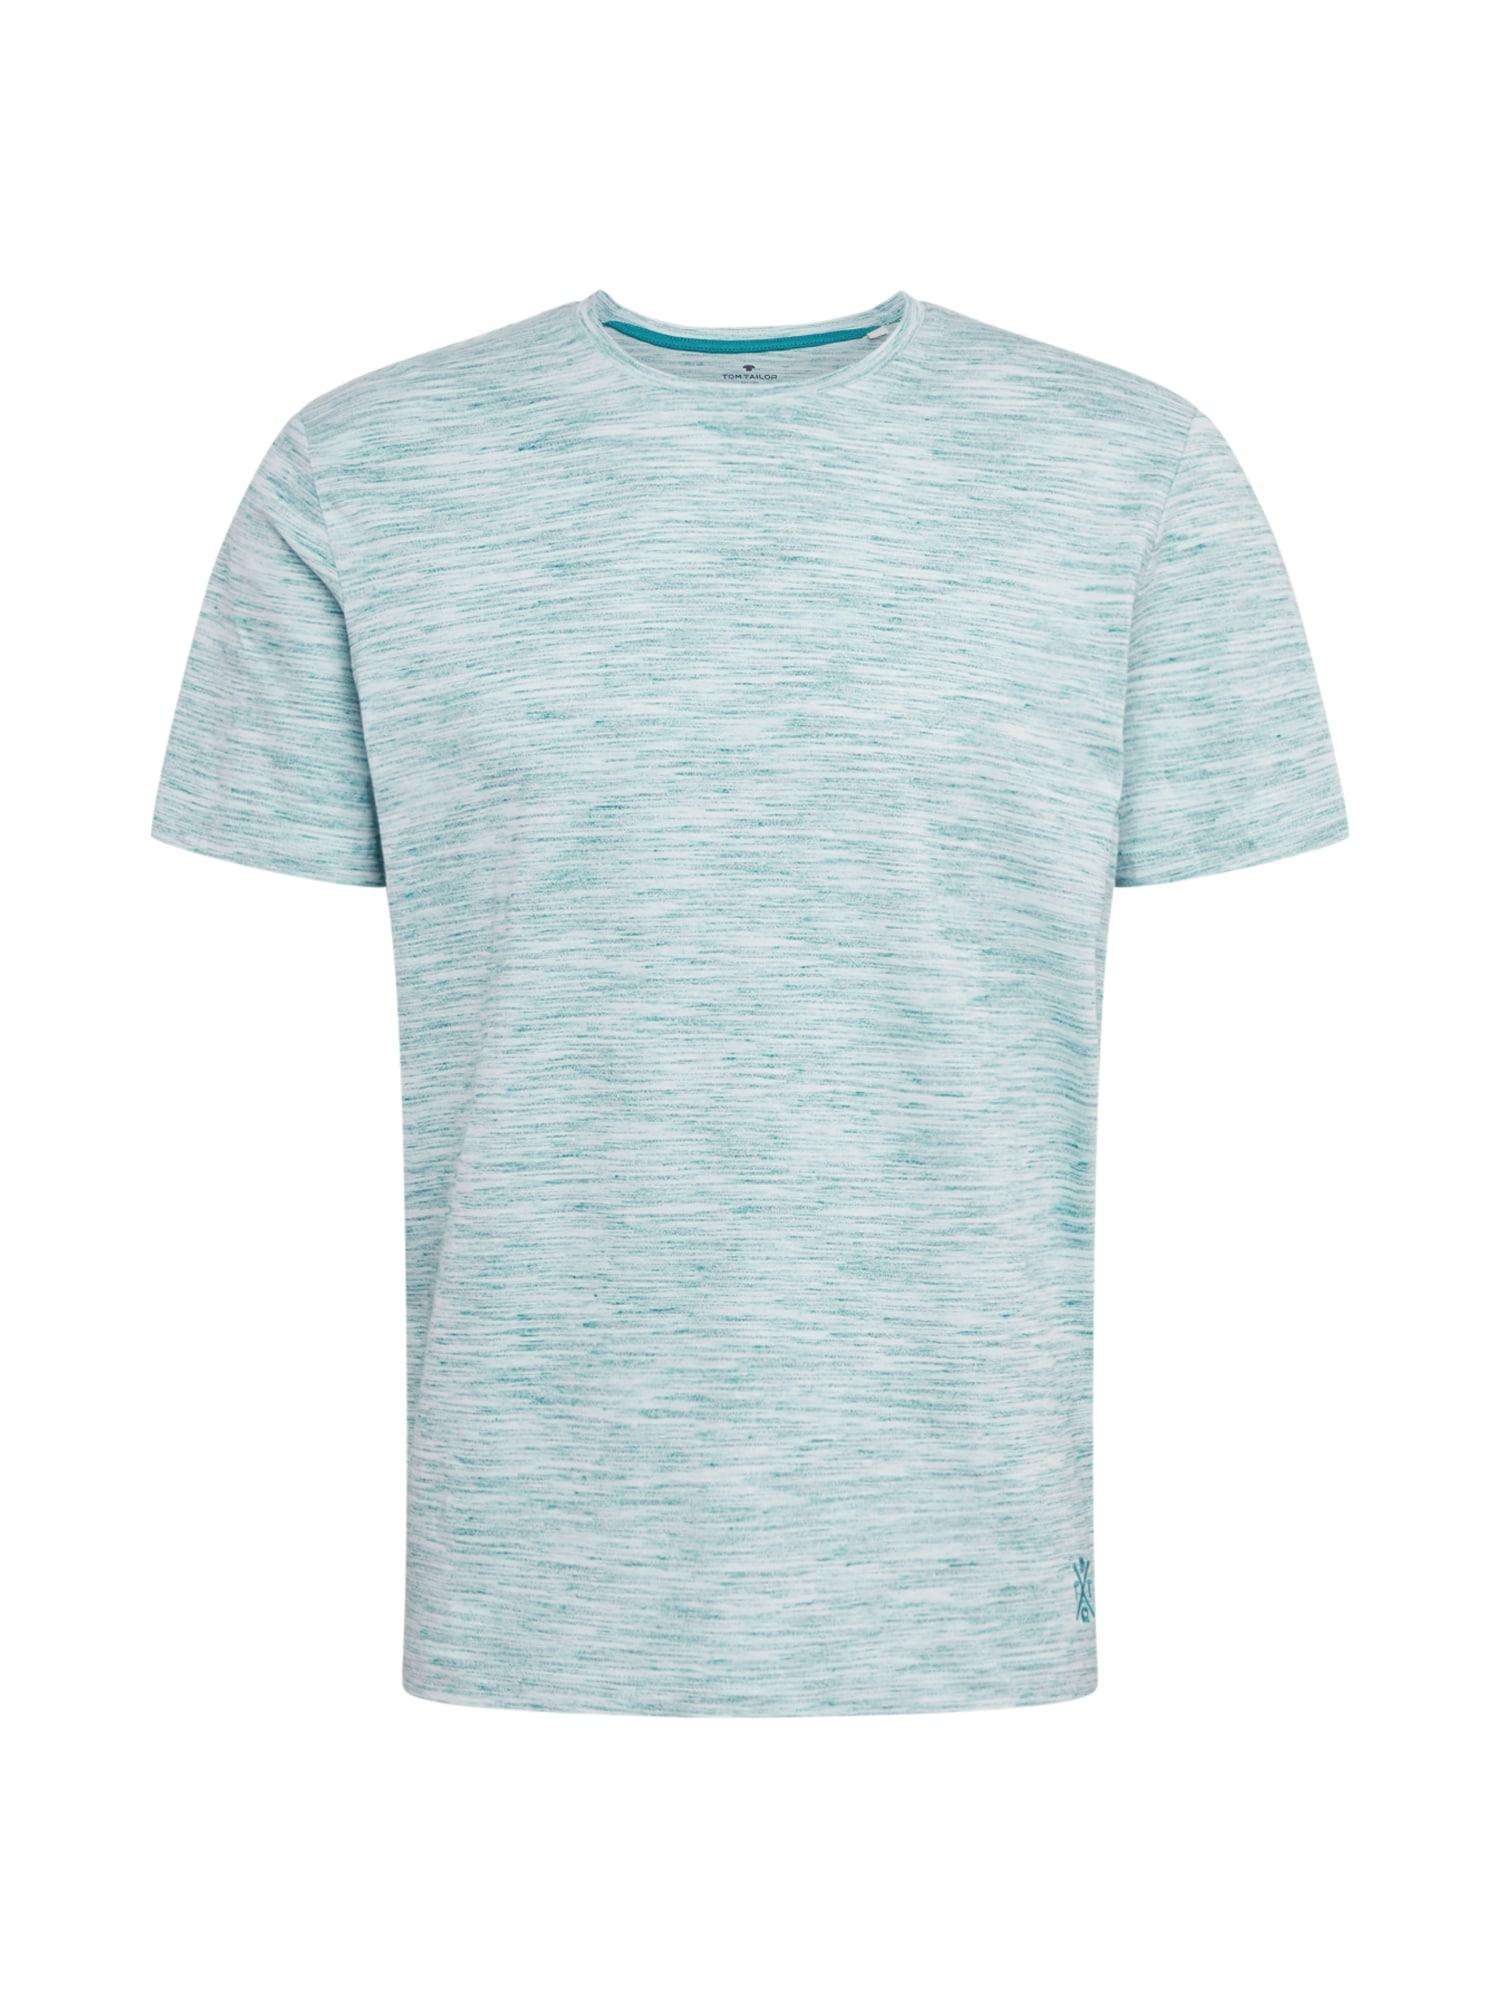 TOM TAILOR Tričko  šedobiela / zelená